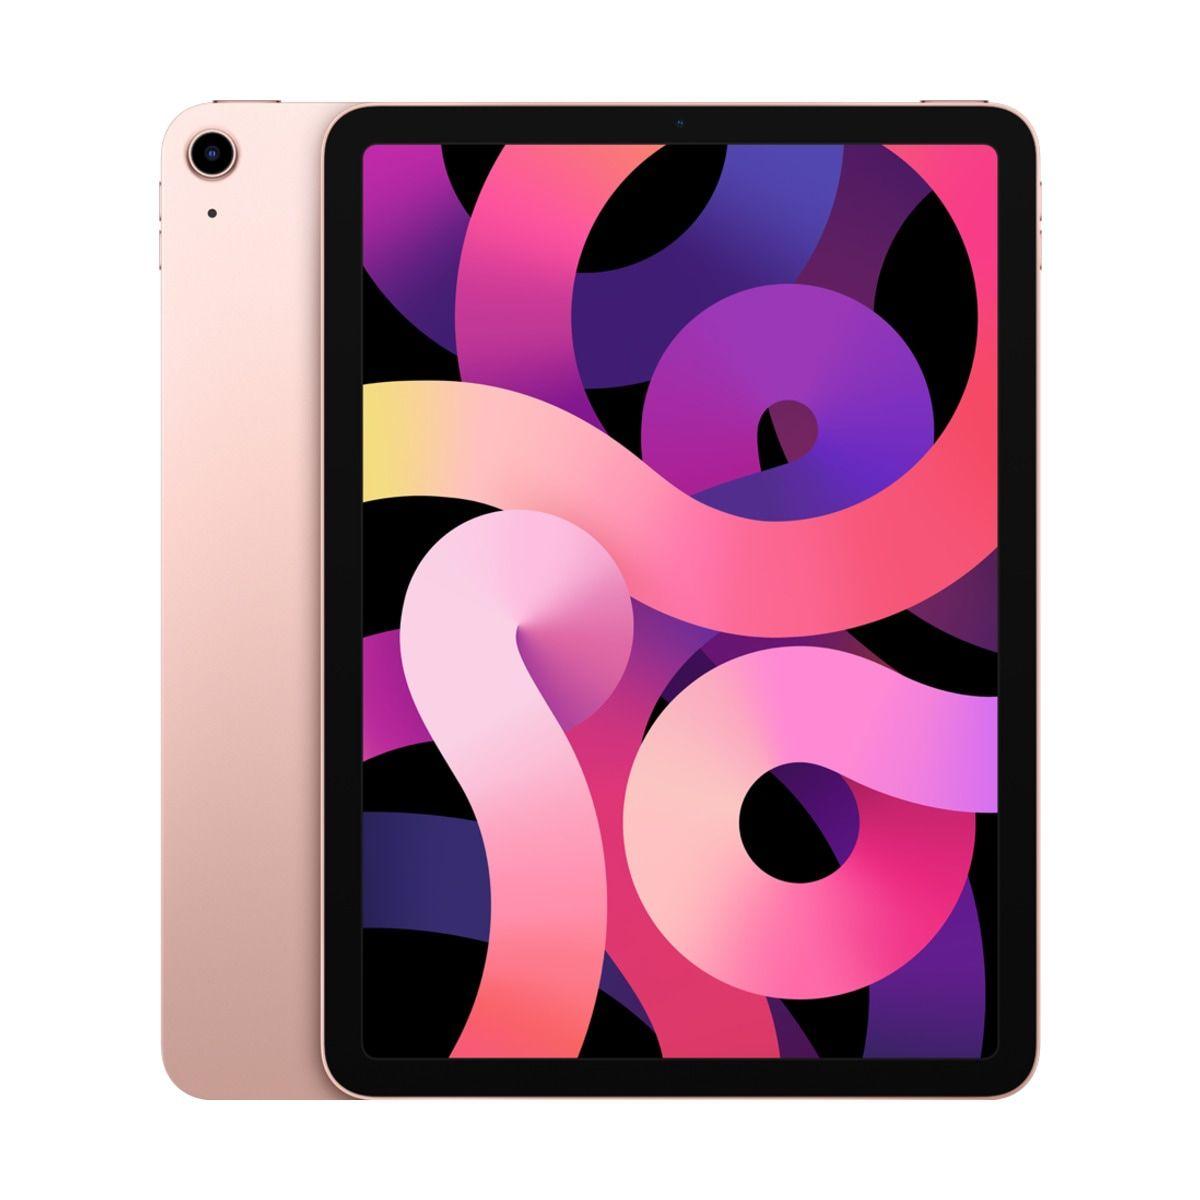 Apple iPad Air Wi-Fi 64GB - Rose Gold / SK